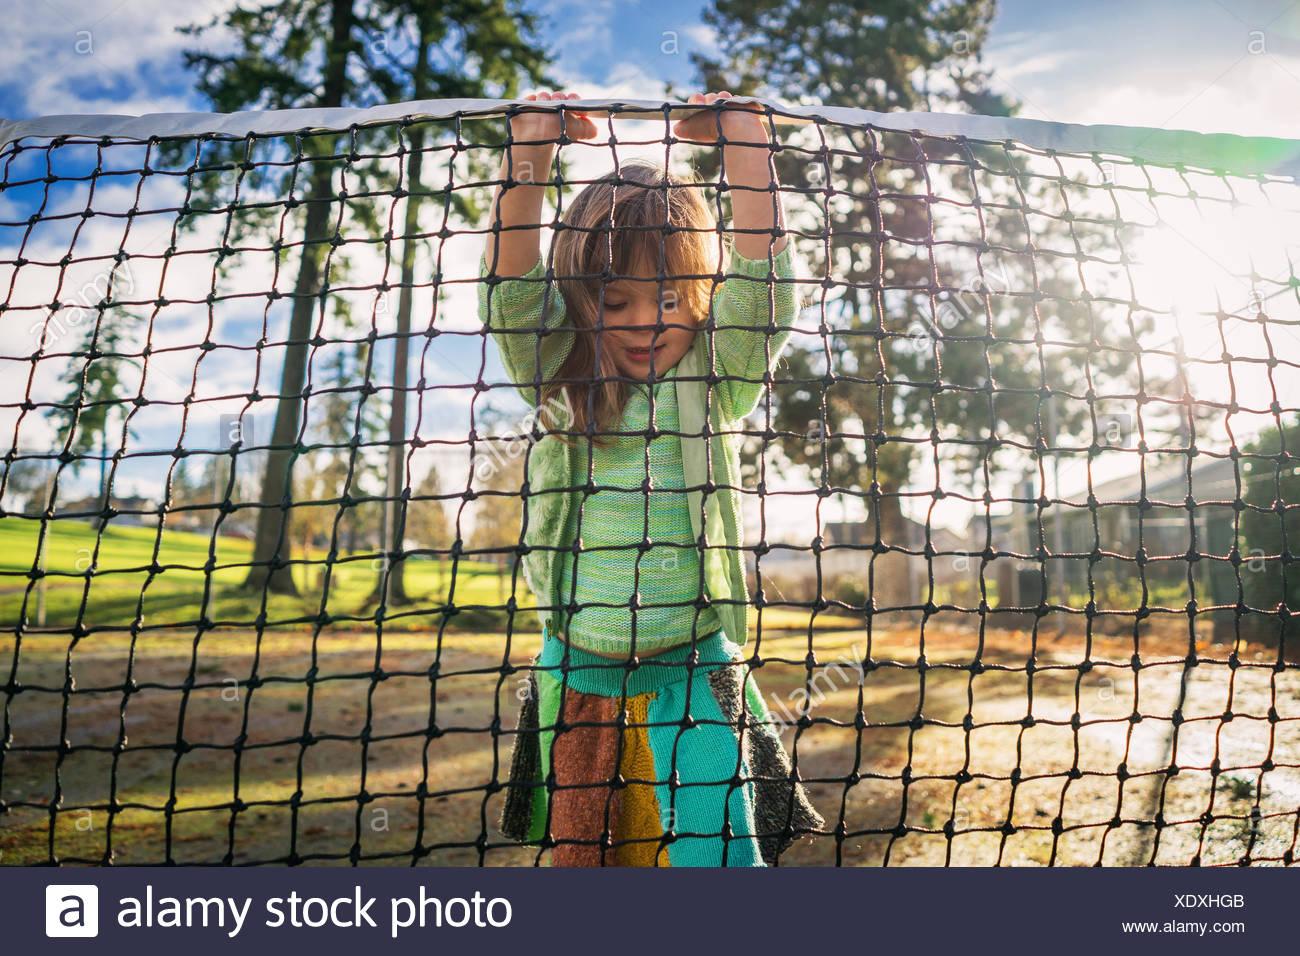 Girl standing on tennis court lifting net - Stock Image